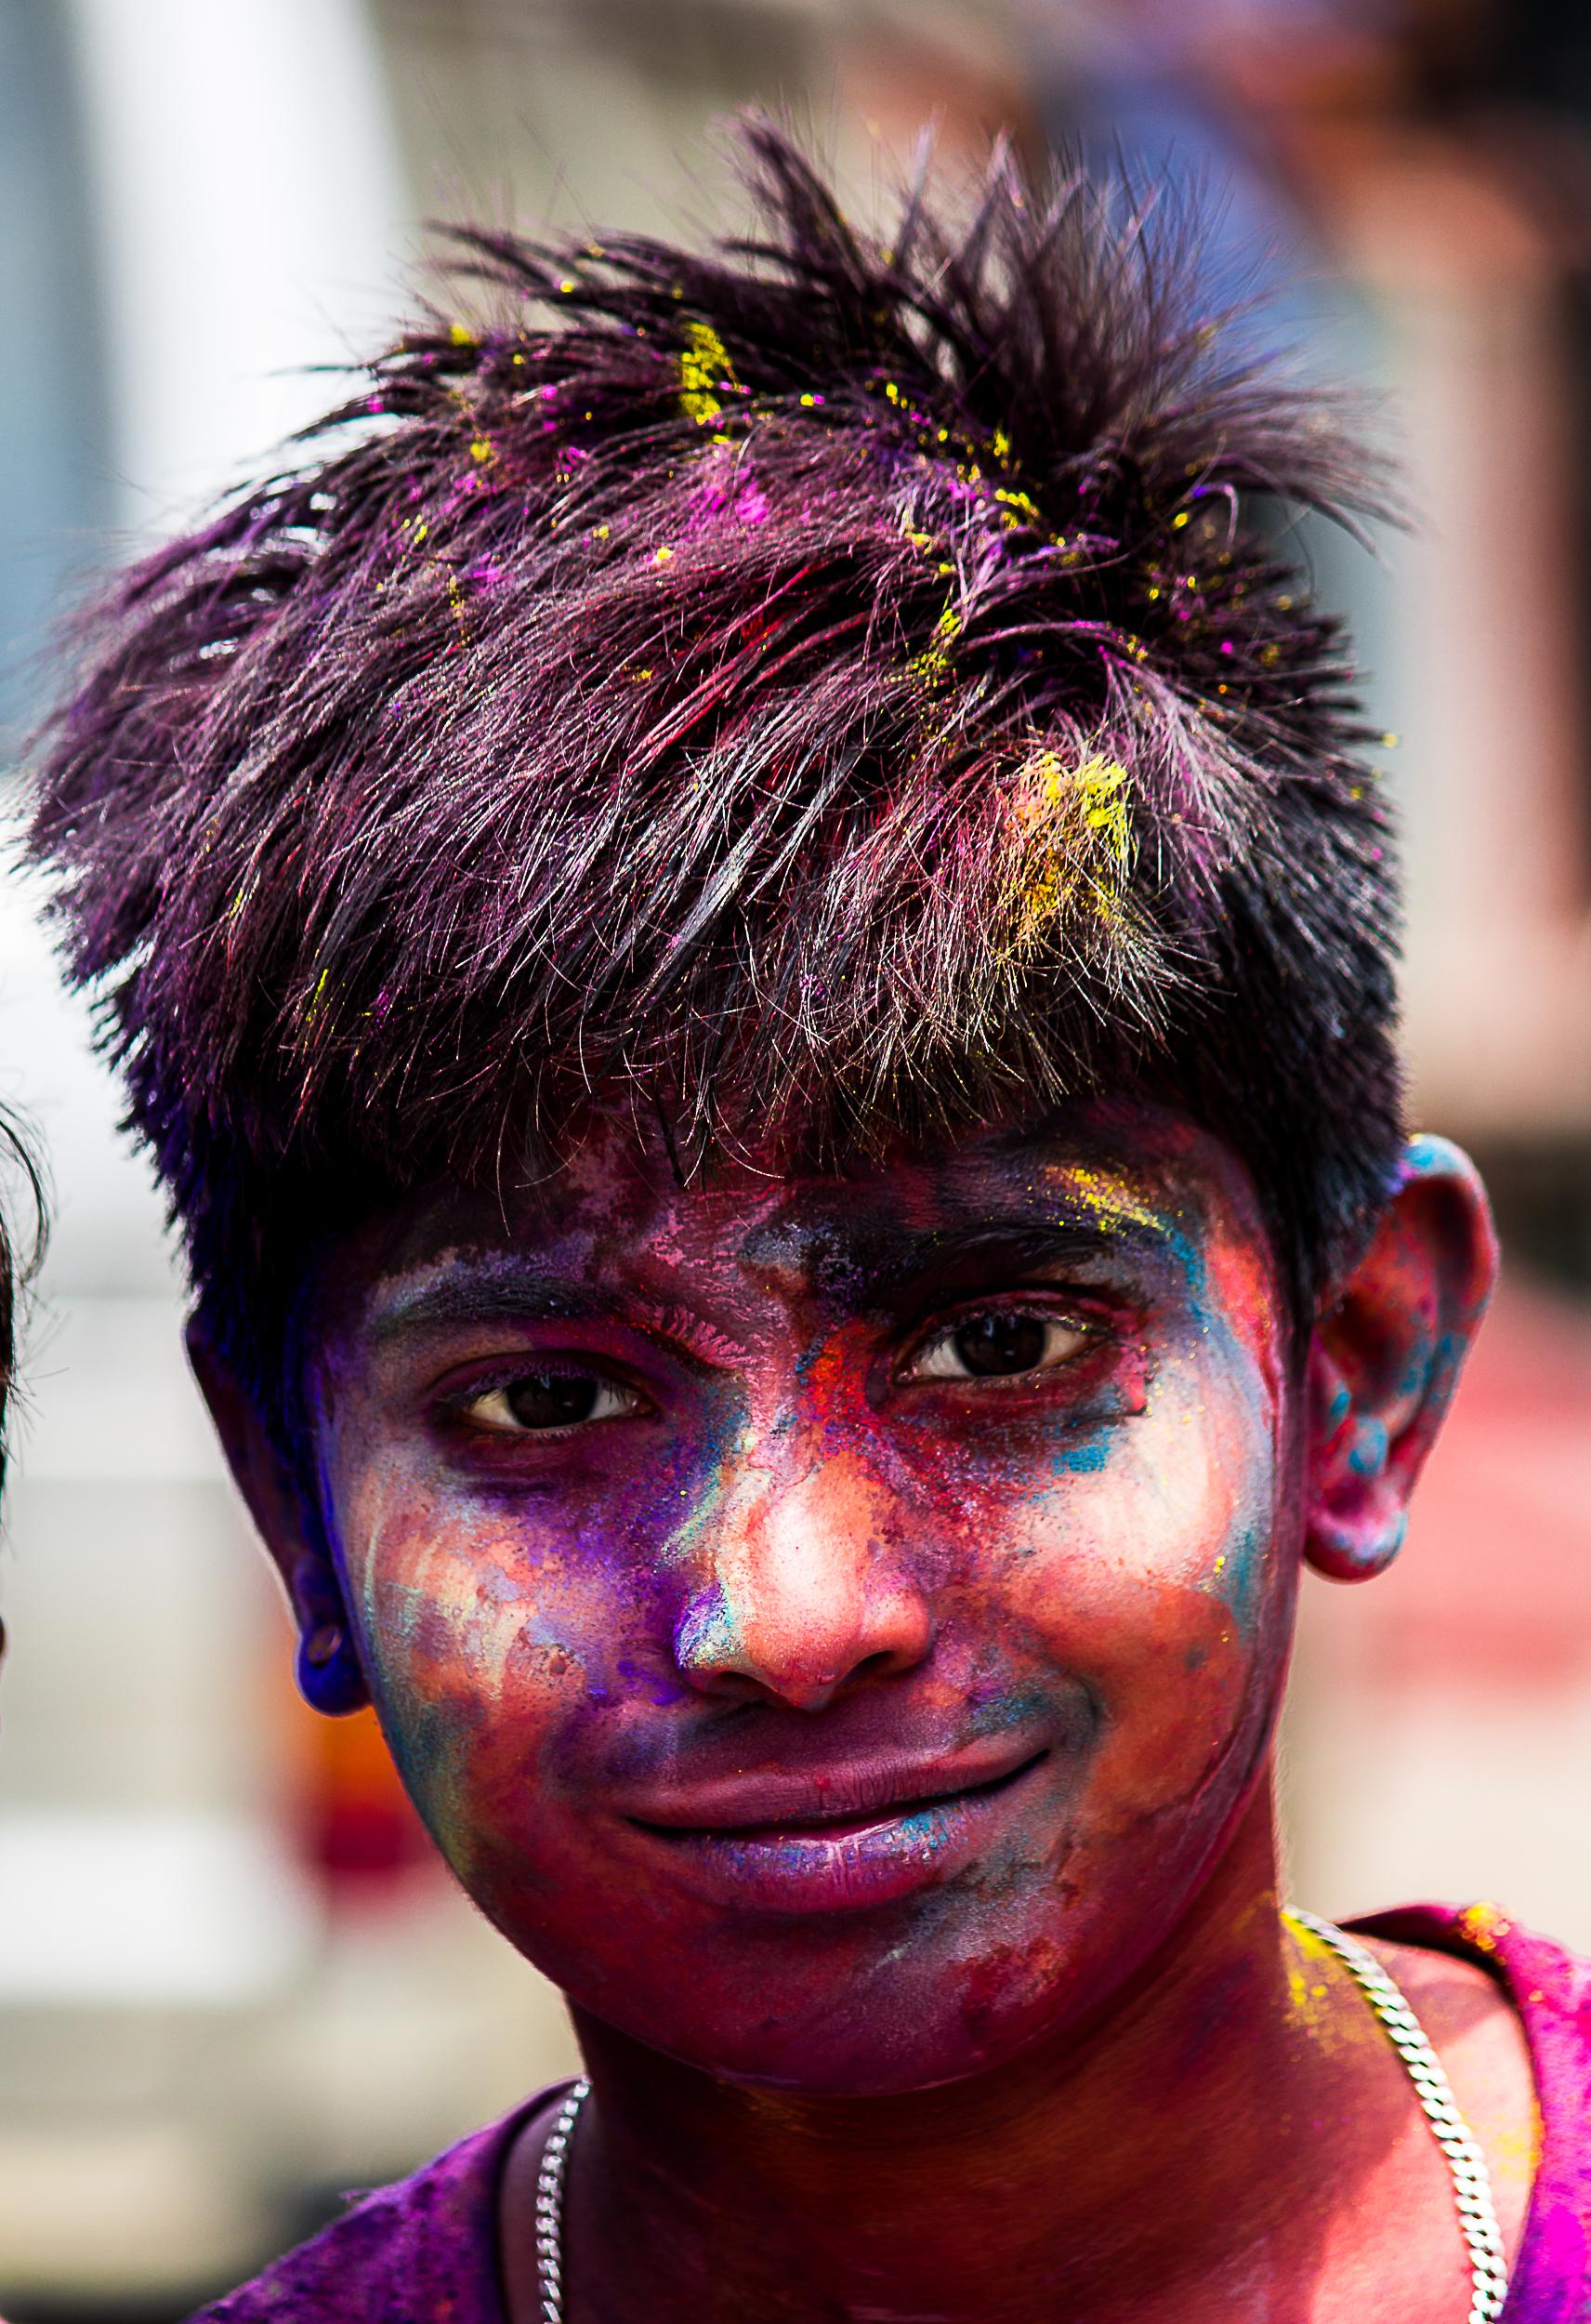 Kid Portrait of Holi Celebration